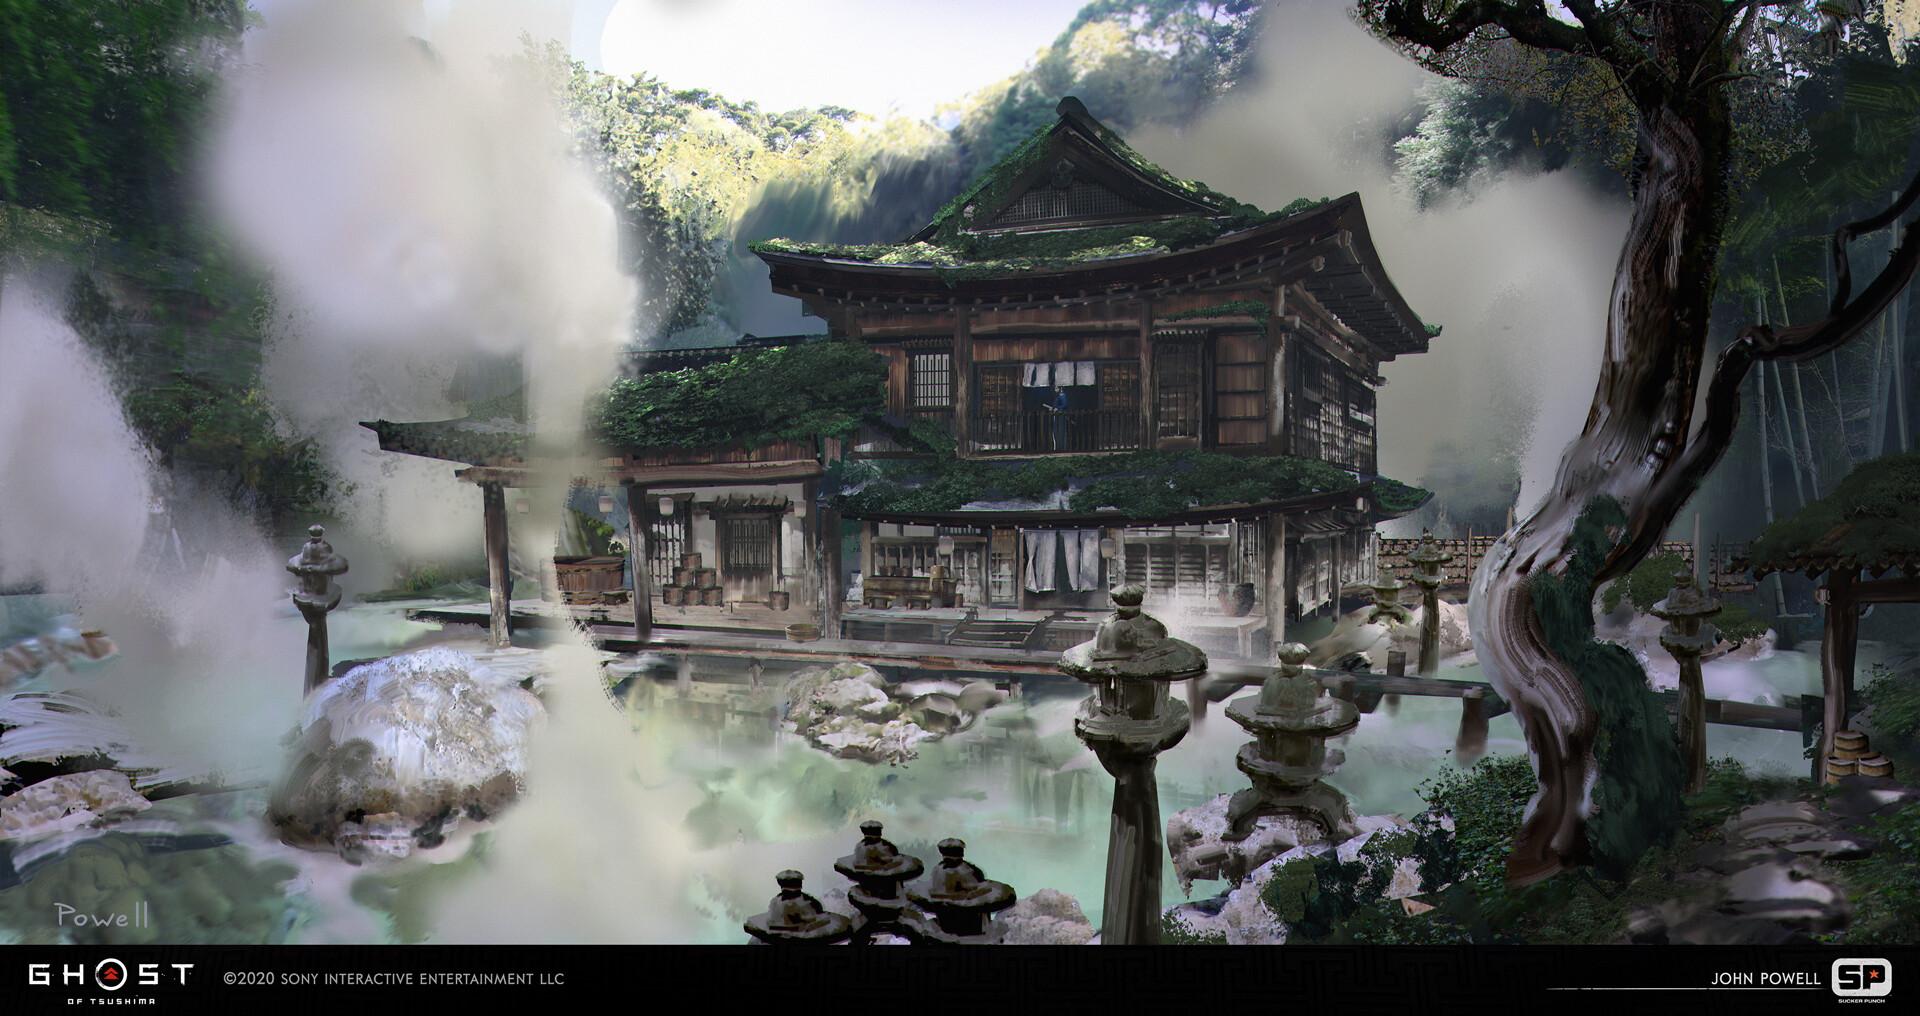 Quelle: ArtStation - John Powell - hiyoshi inn